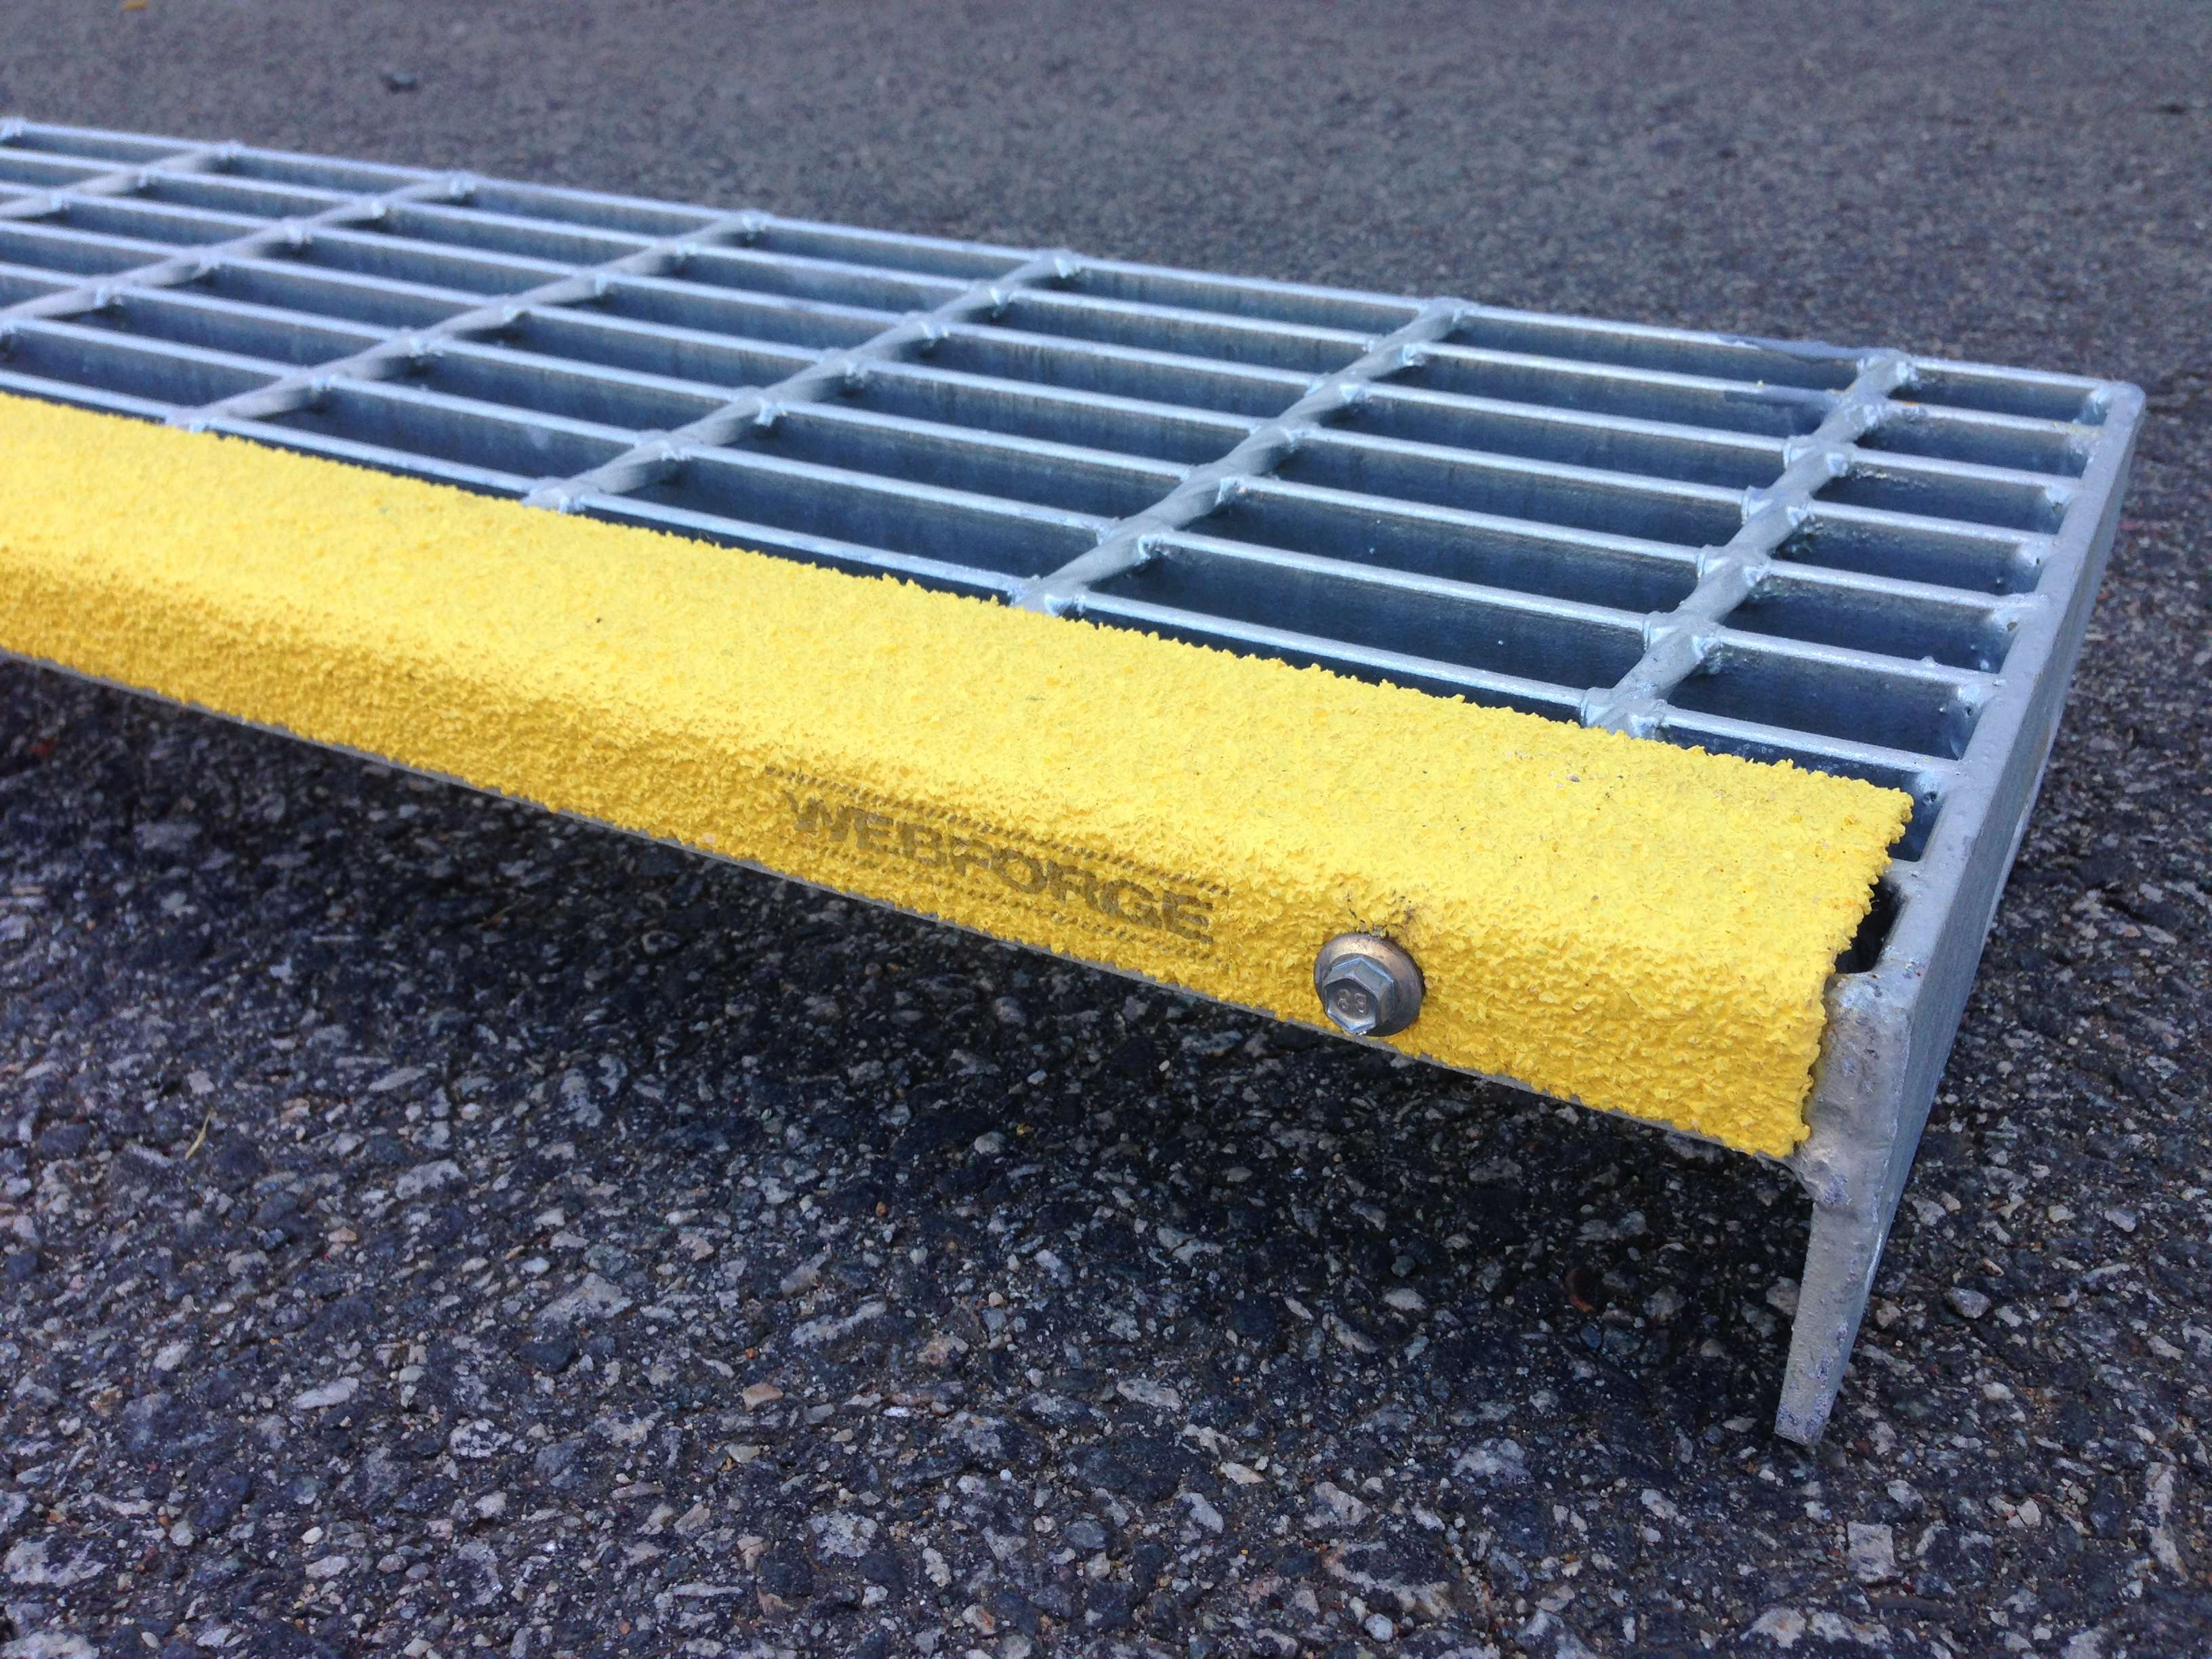 Anti Slip Coatings For Stairs : Webgrip anti slip